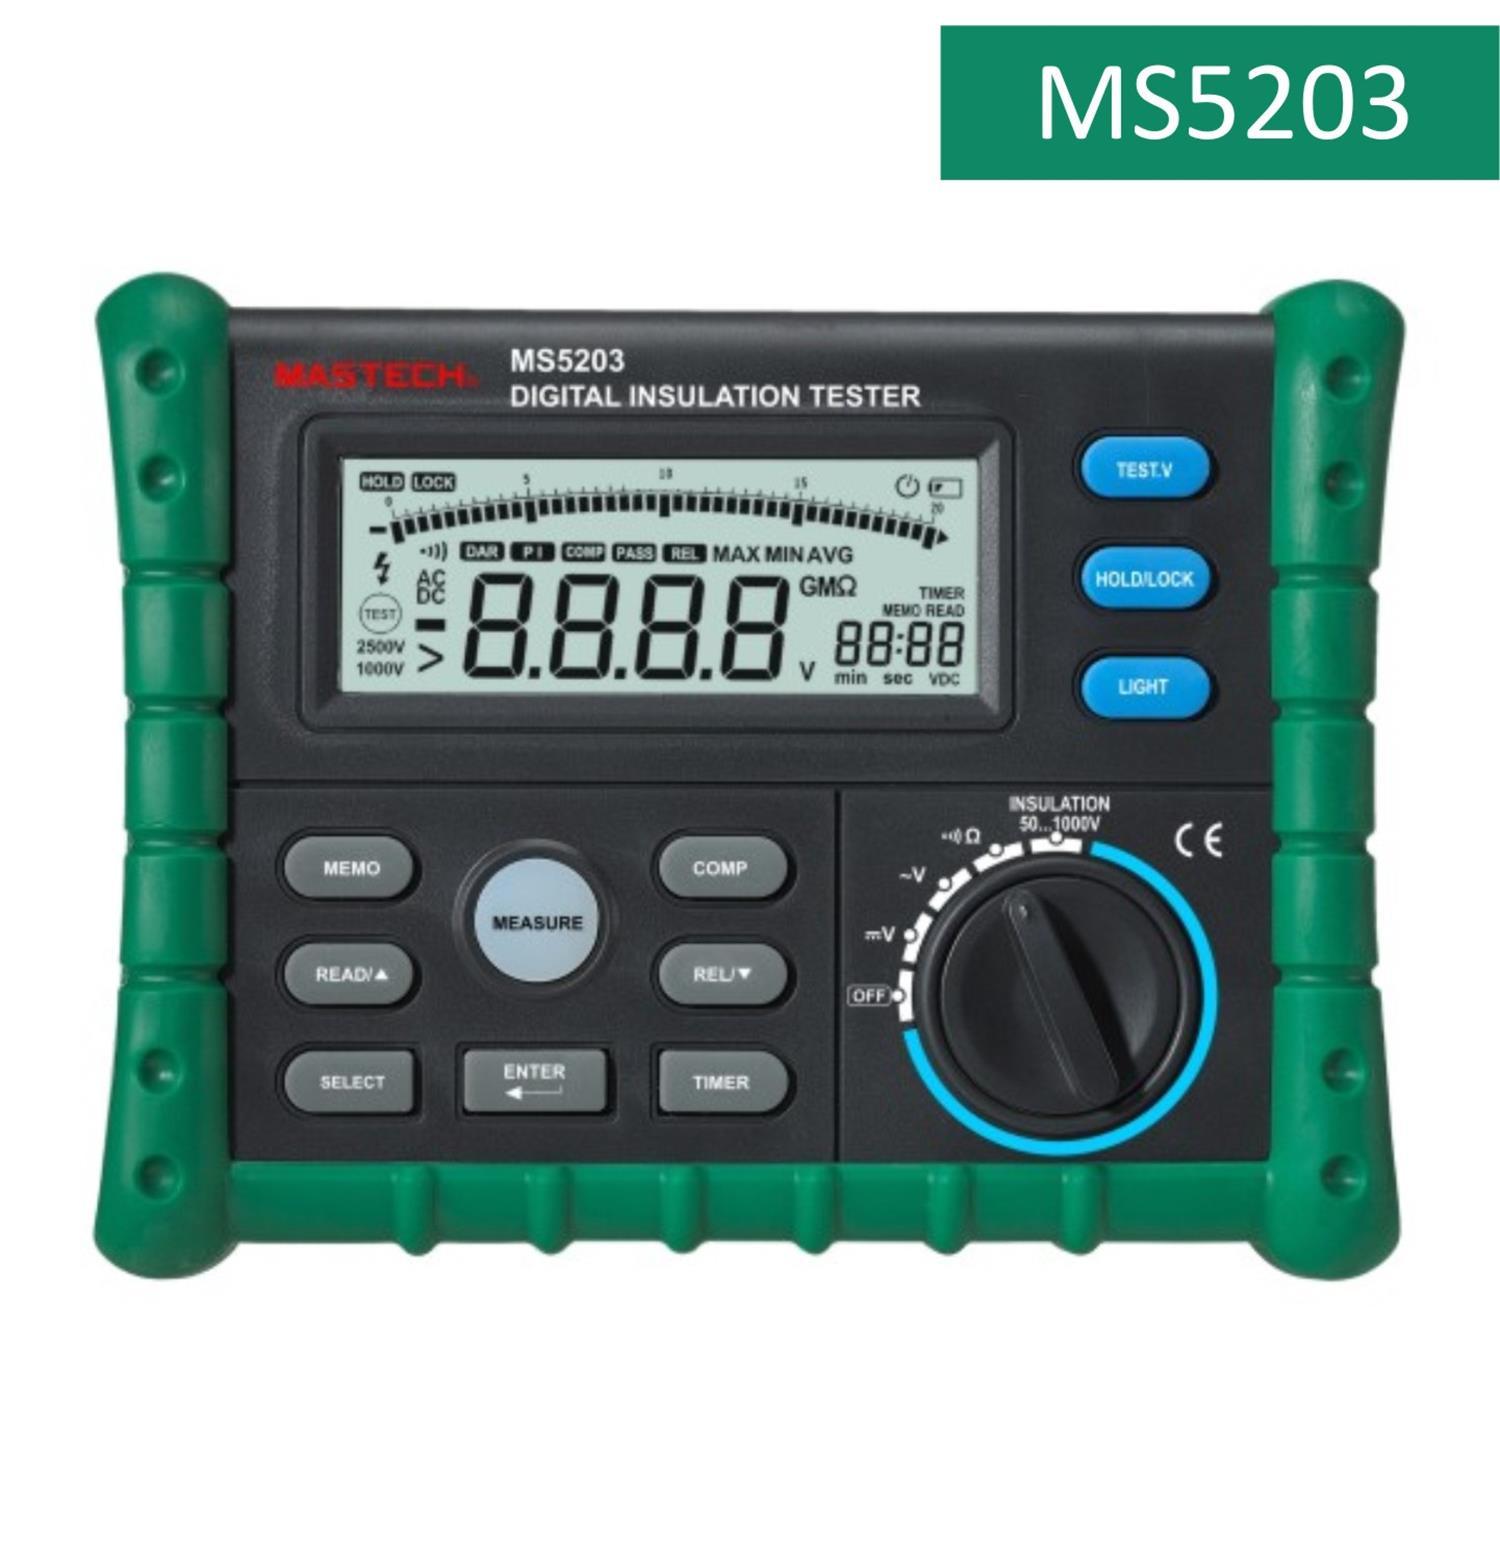 MS5203